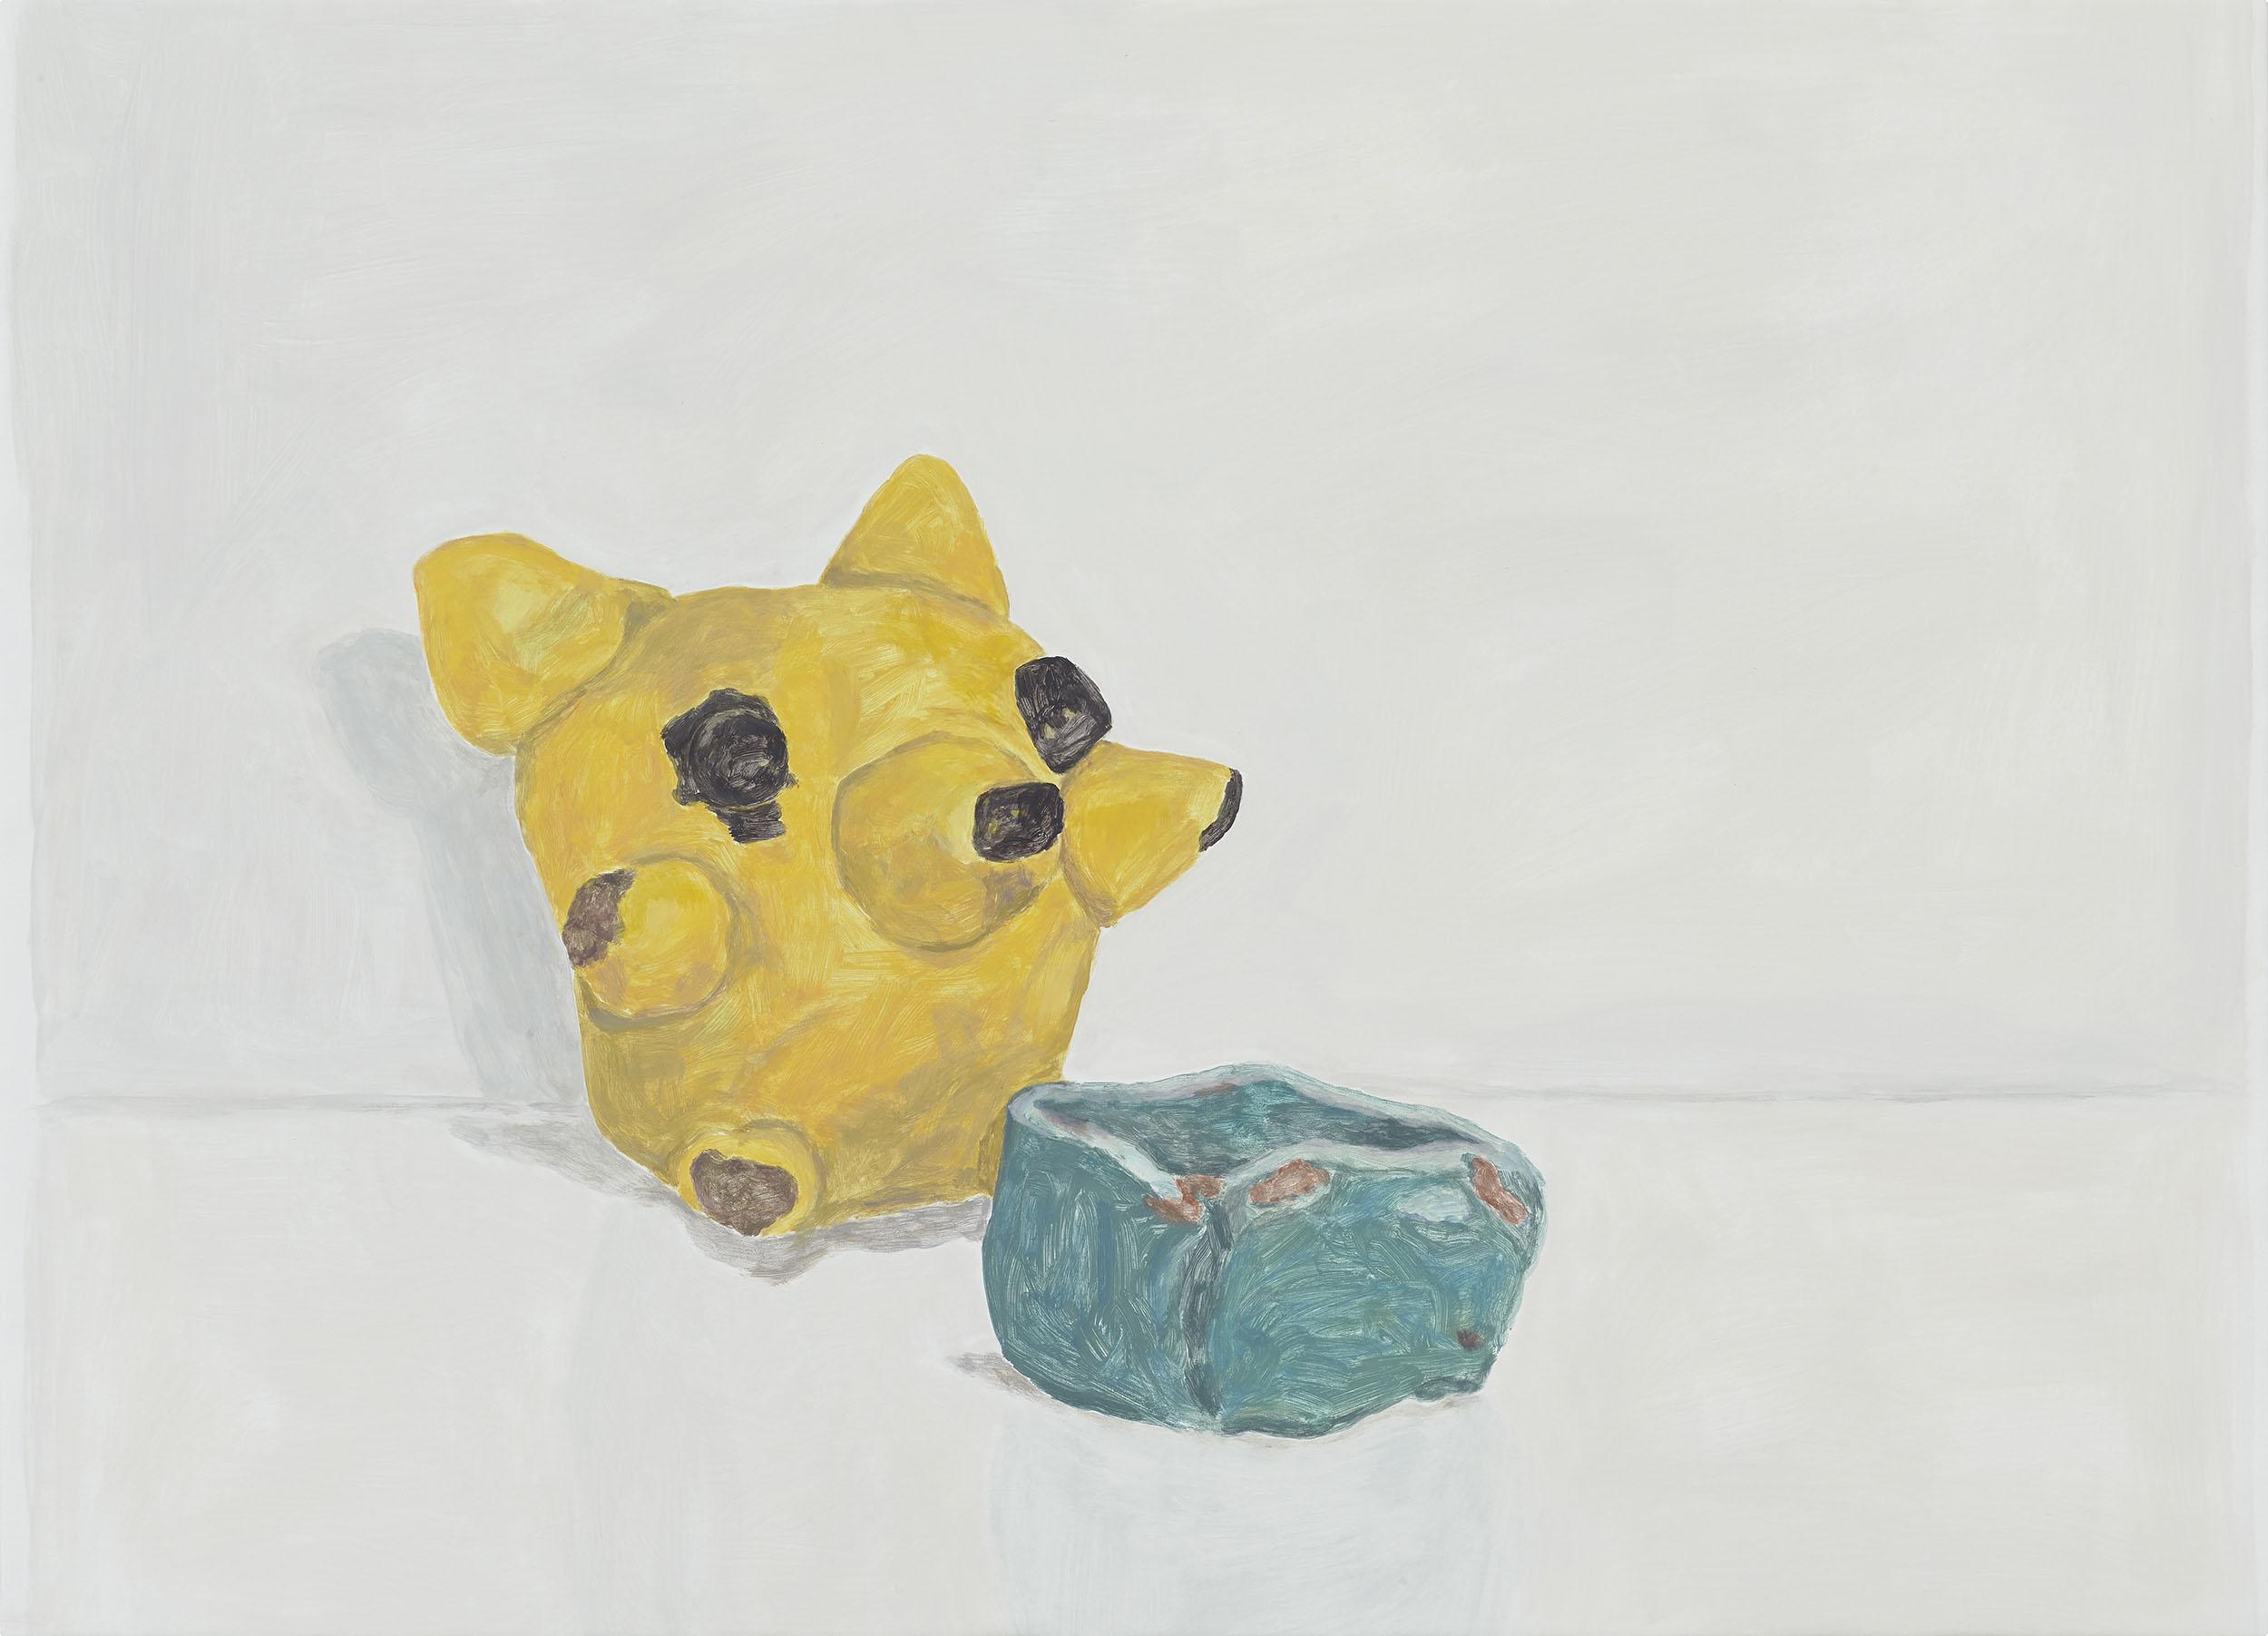 Koala Bear, acrylic on canvas over board, 30 x 41.5 inches, 2018.